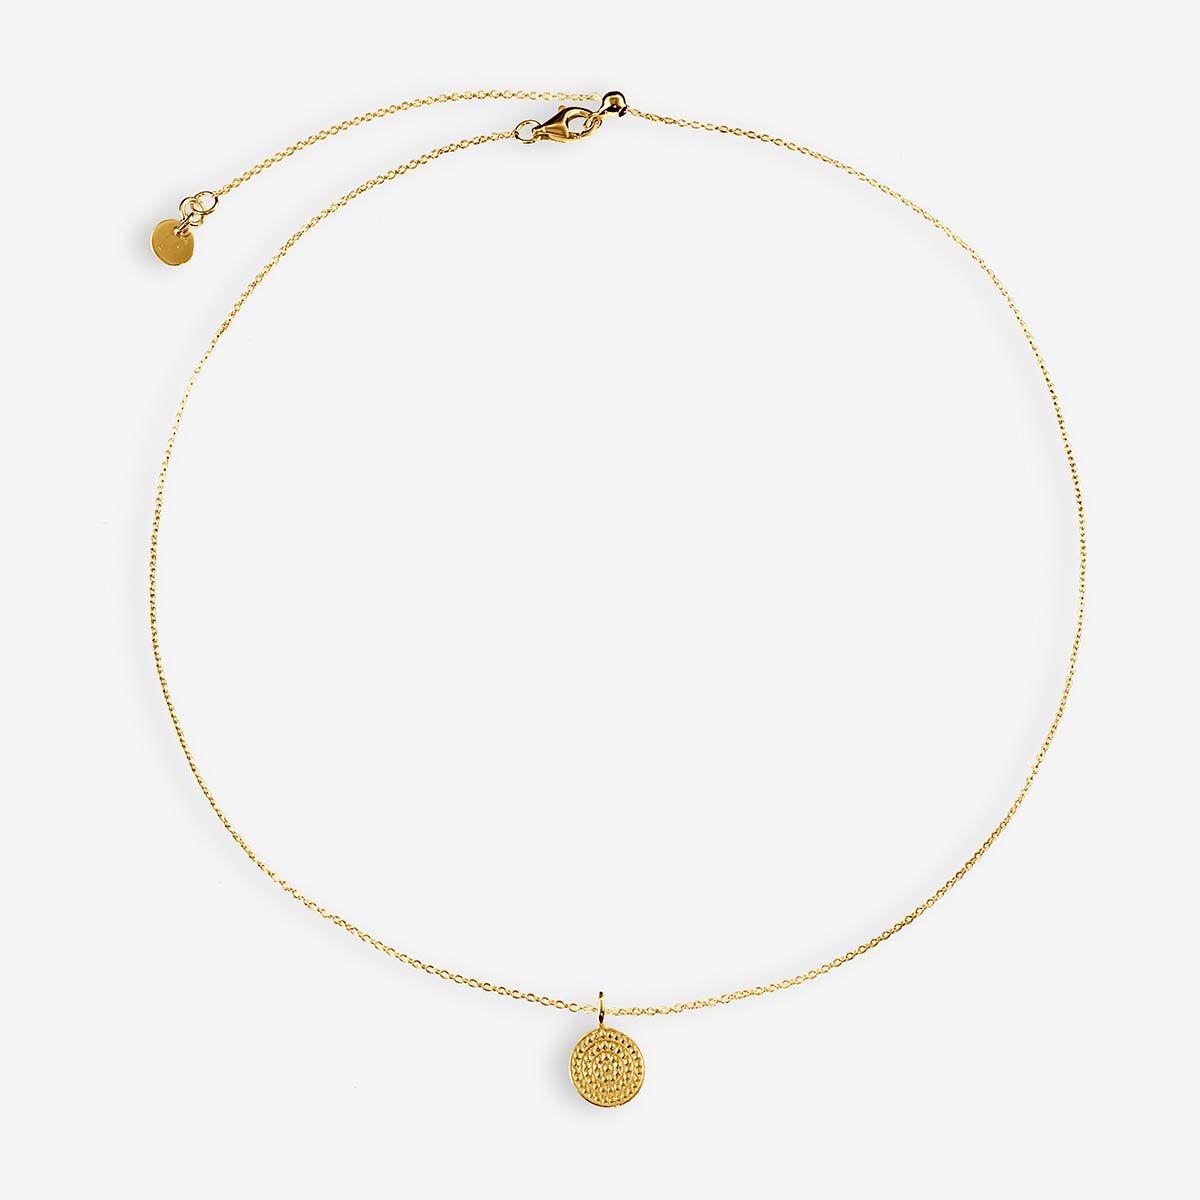 Coin necklace - Halsketten - Gold